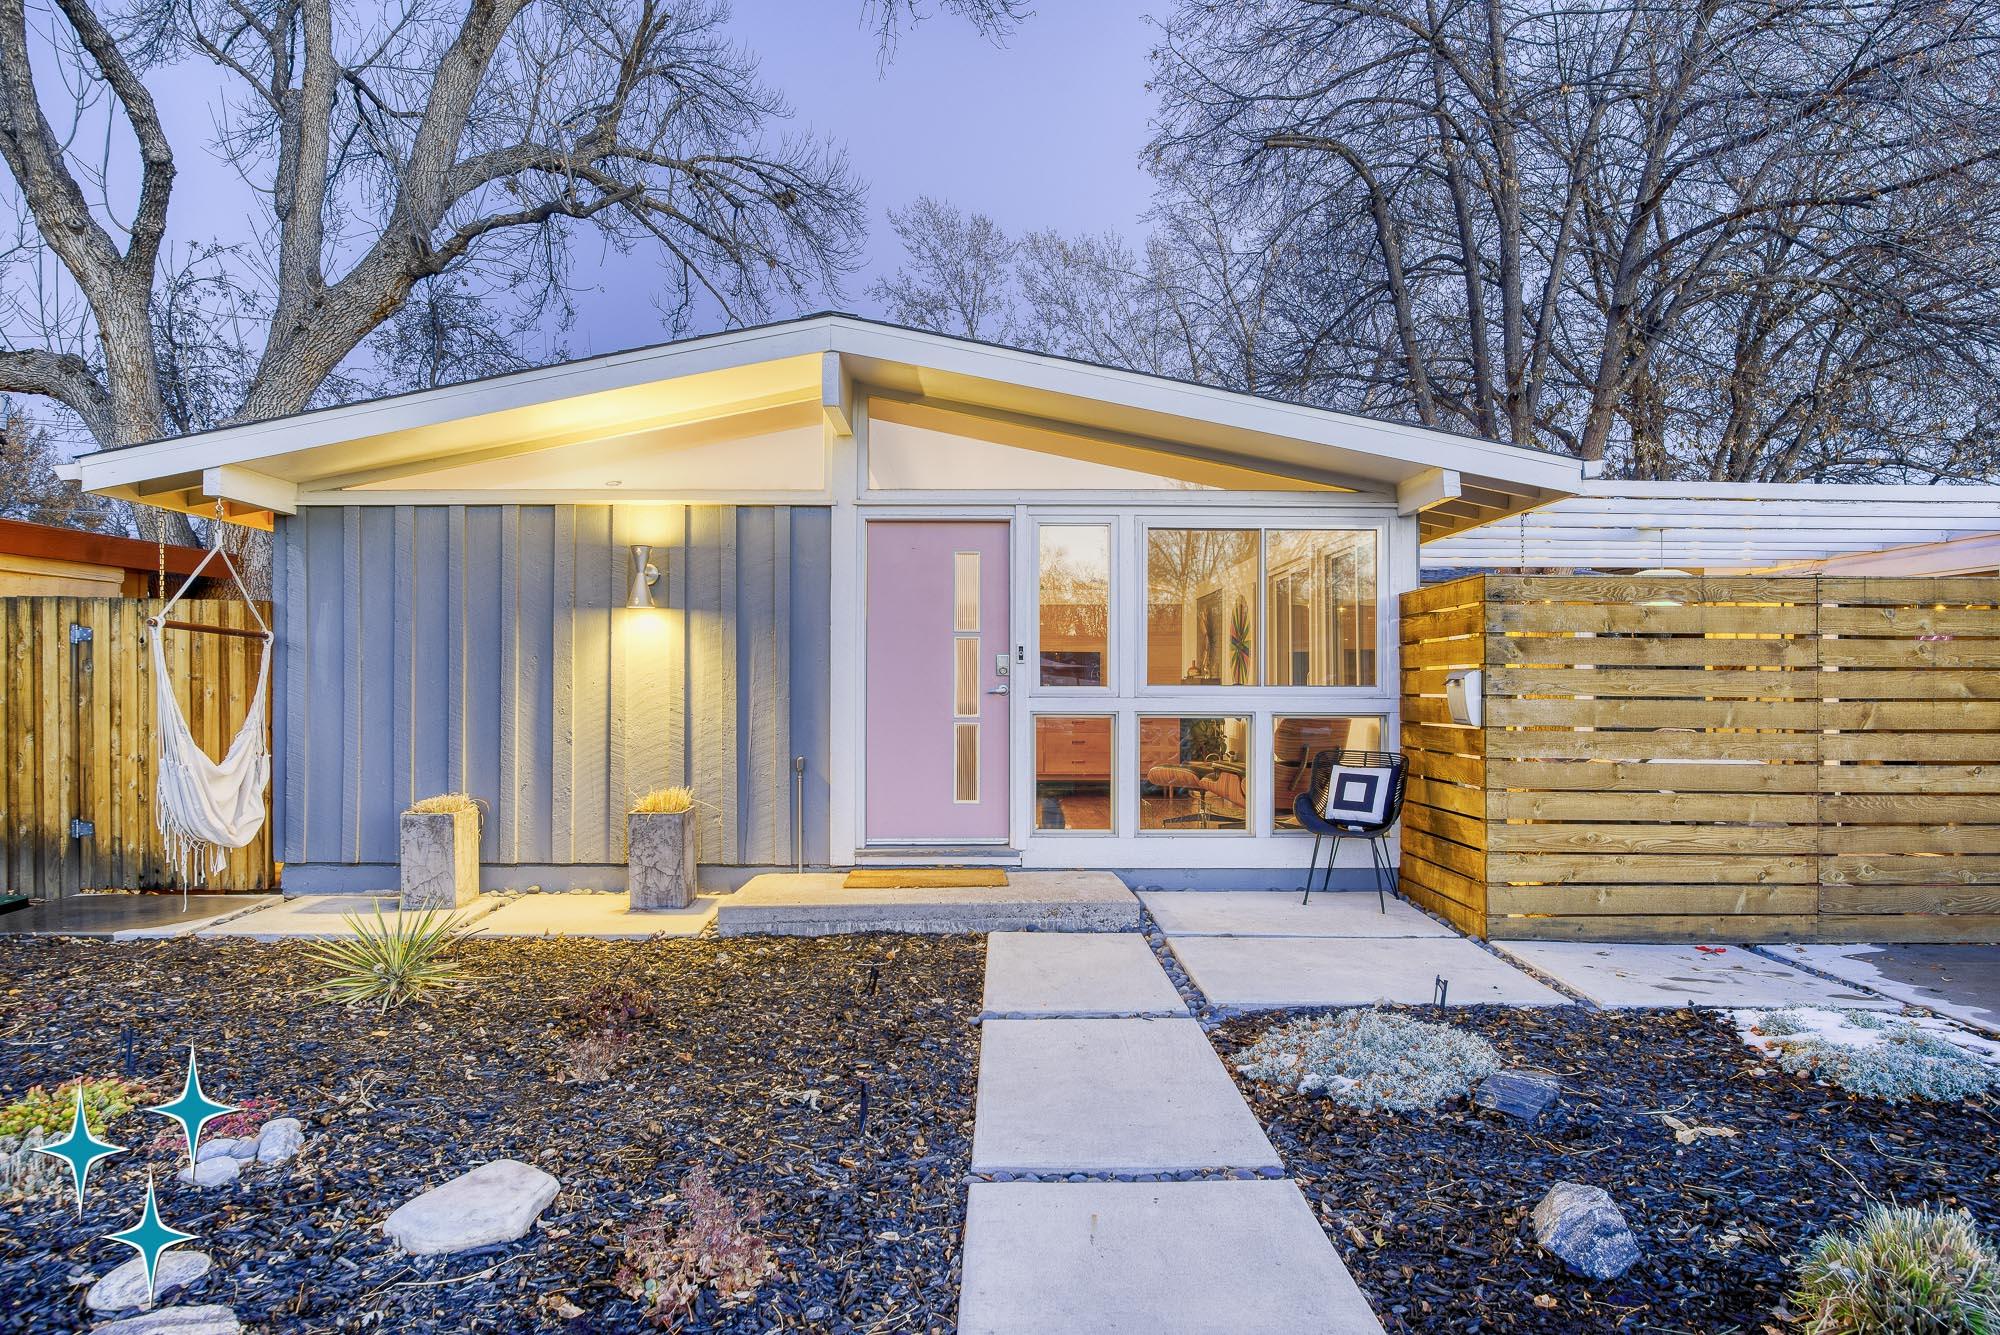 Adrian-Kinney-2530-S-Osceola-St-Cliff-May-Home-2000w50-3swm-6.jpg